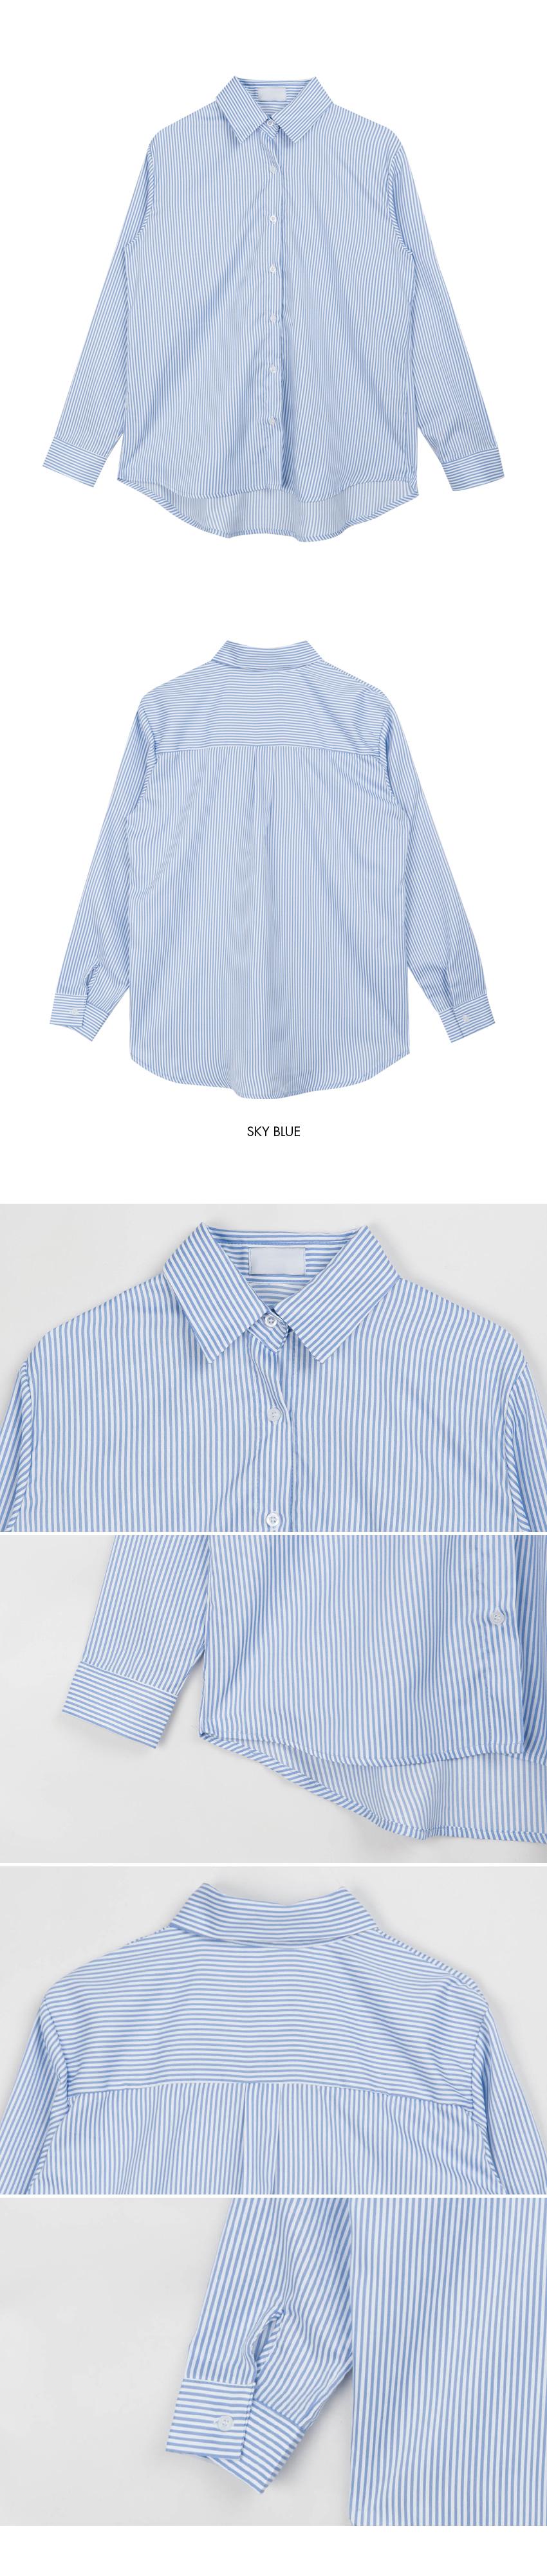 Daily striped shirt